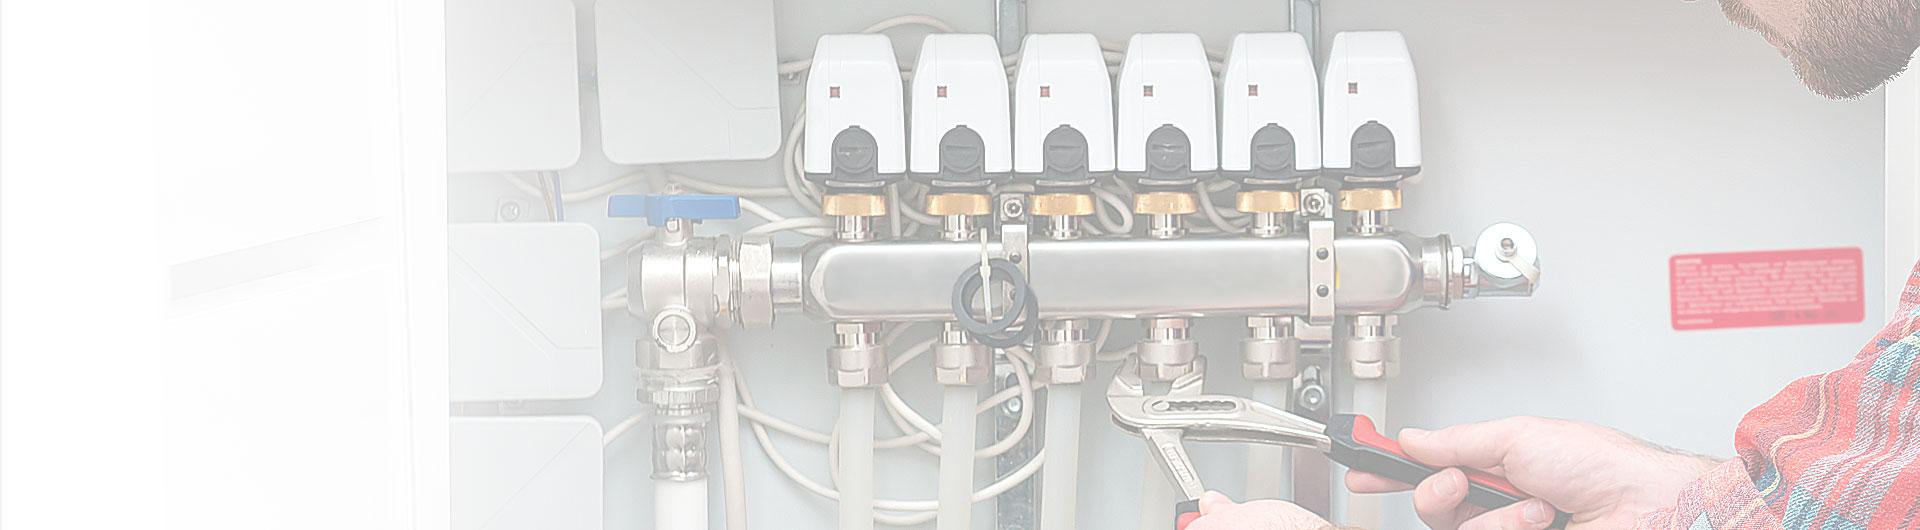 Maintenance & Compliance Testing